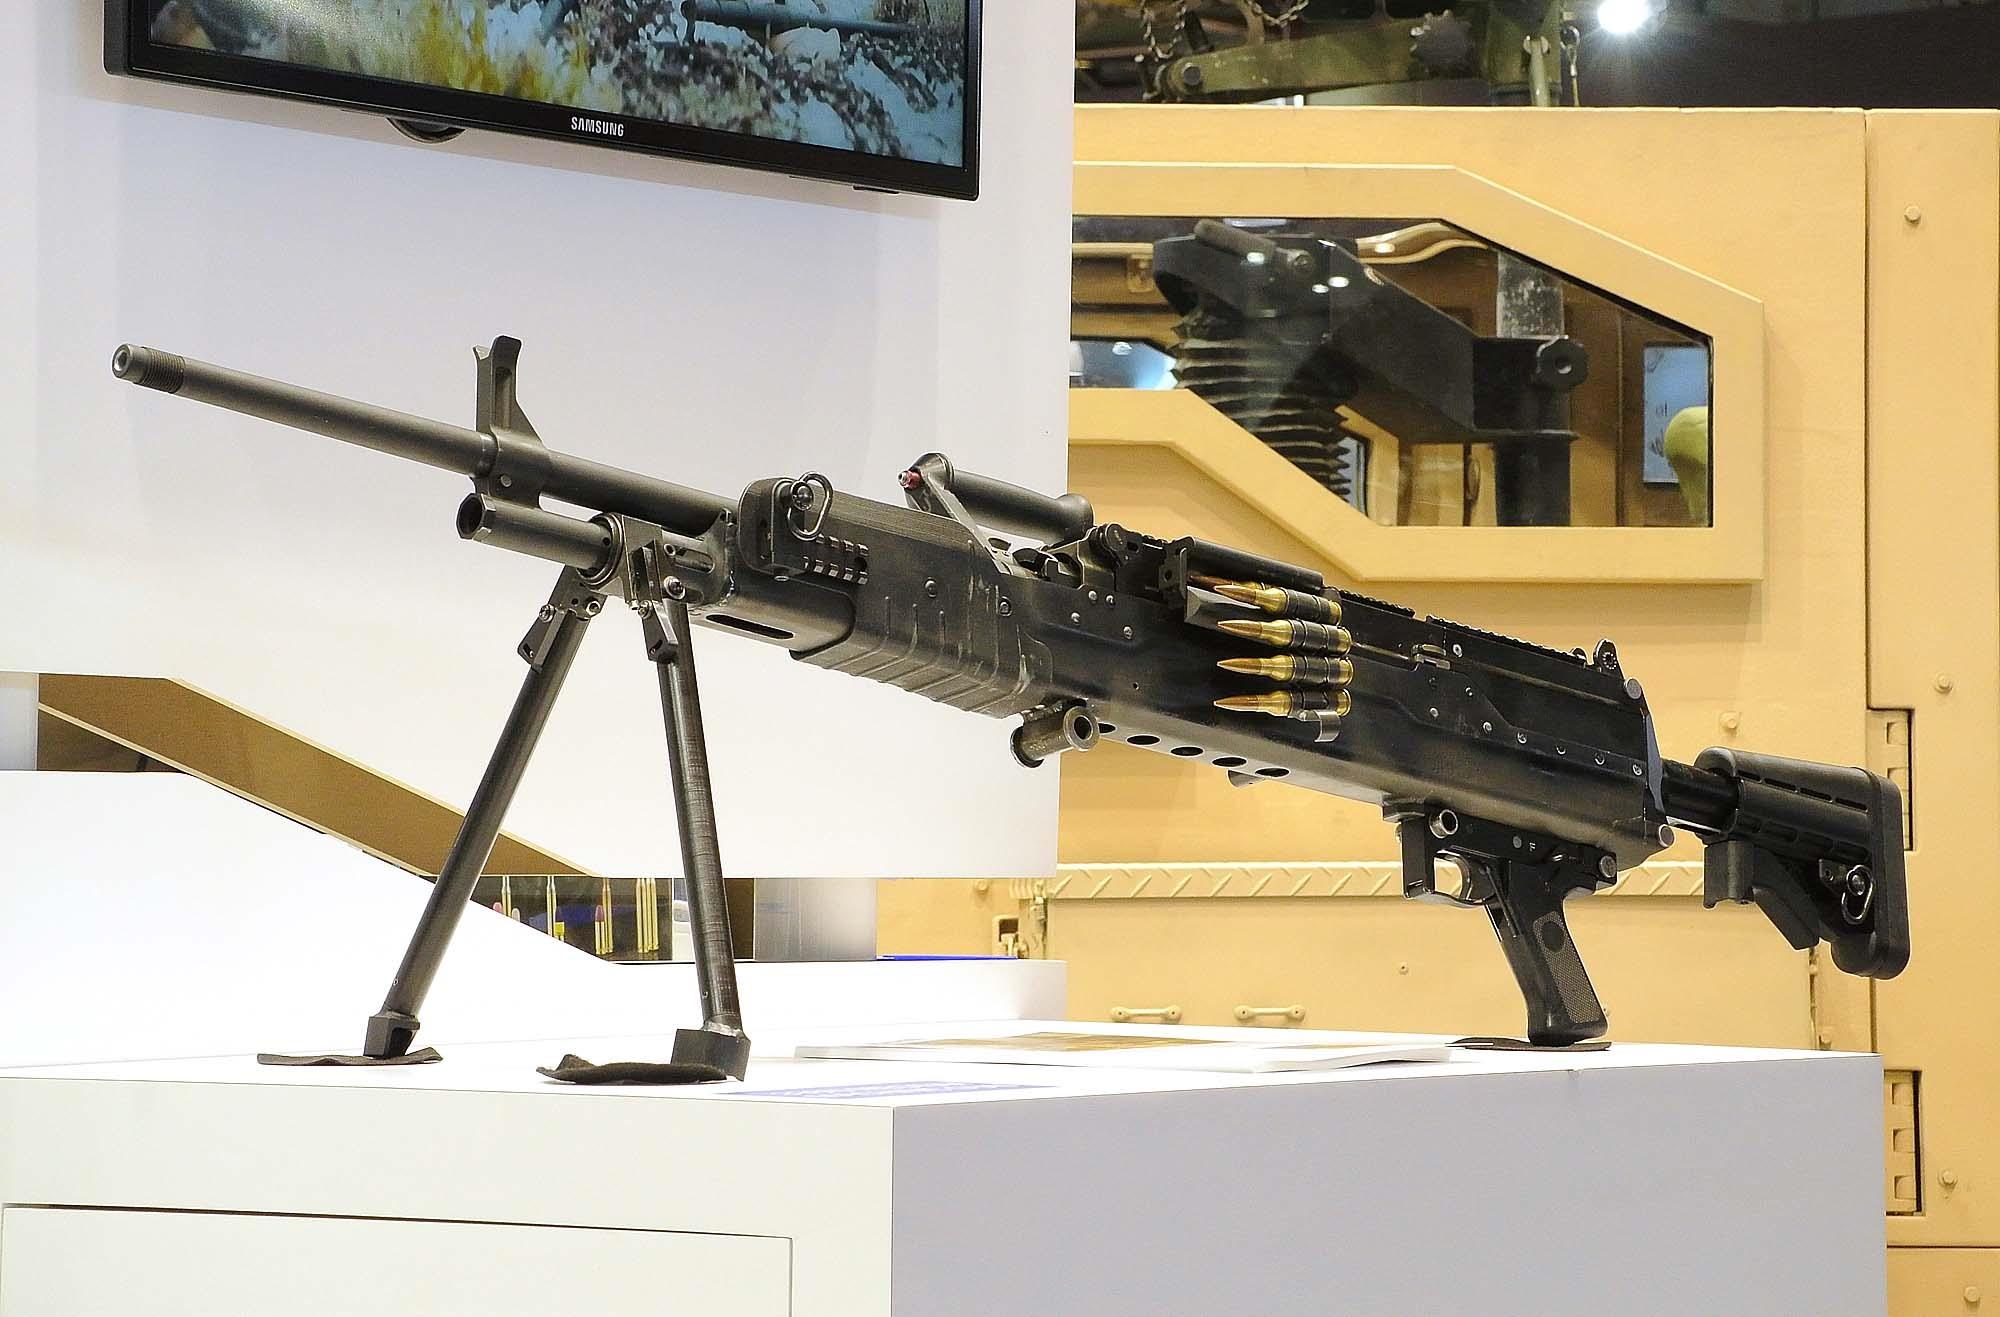 338 machine gun